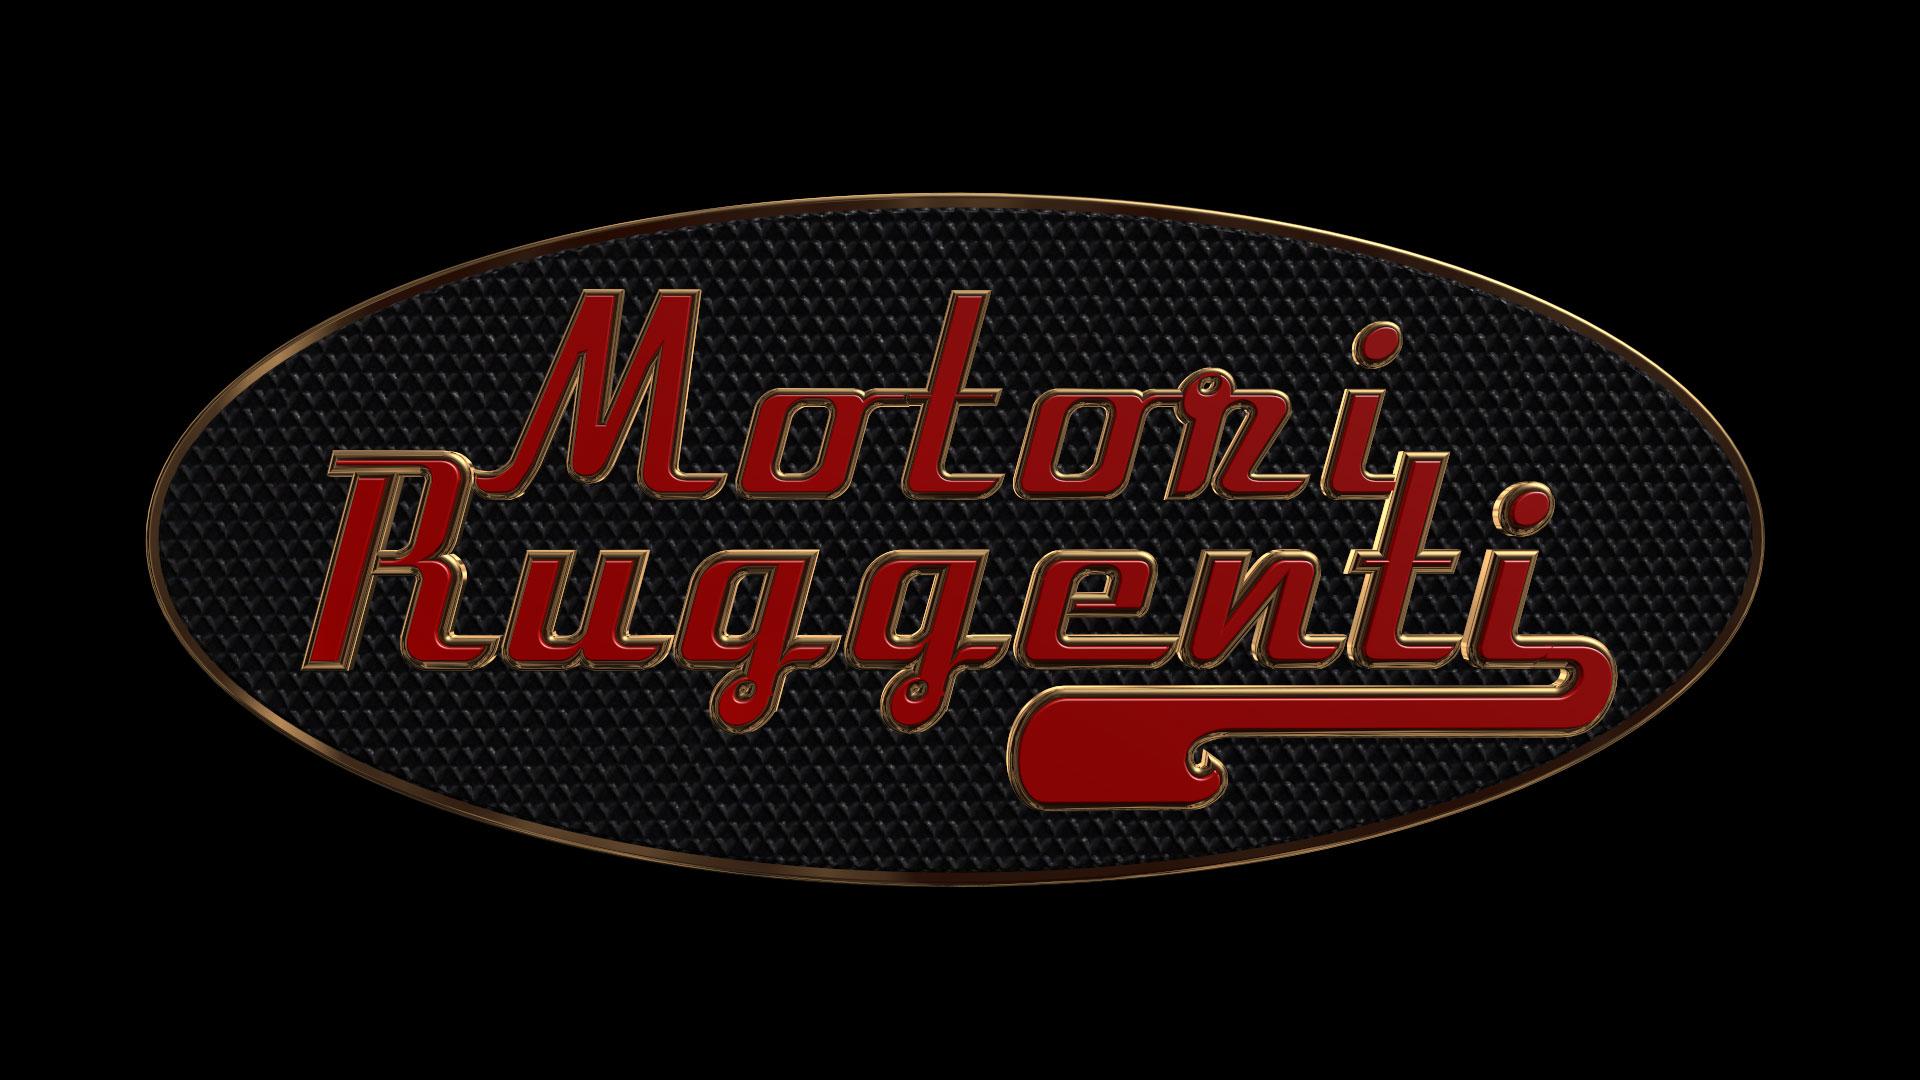 Motori Ruggenti di Marco Spagnoli